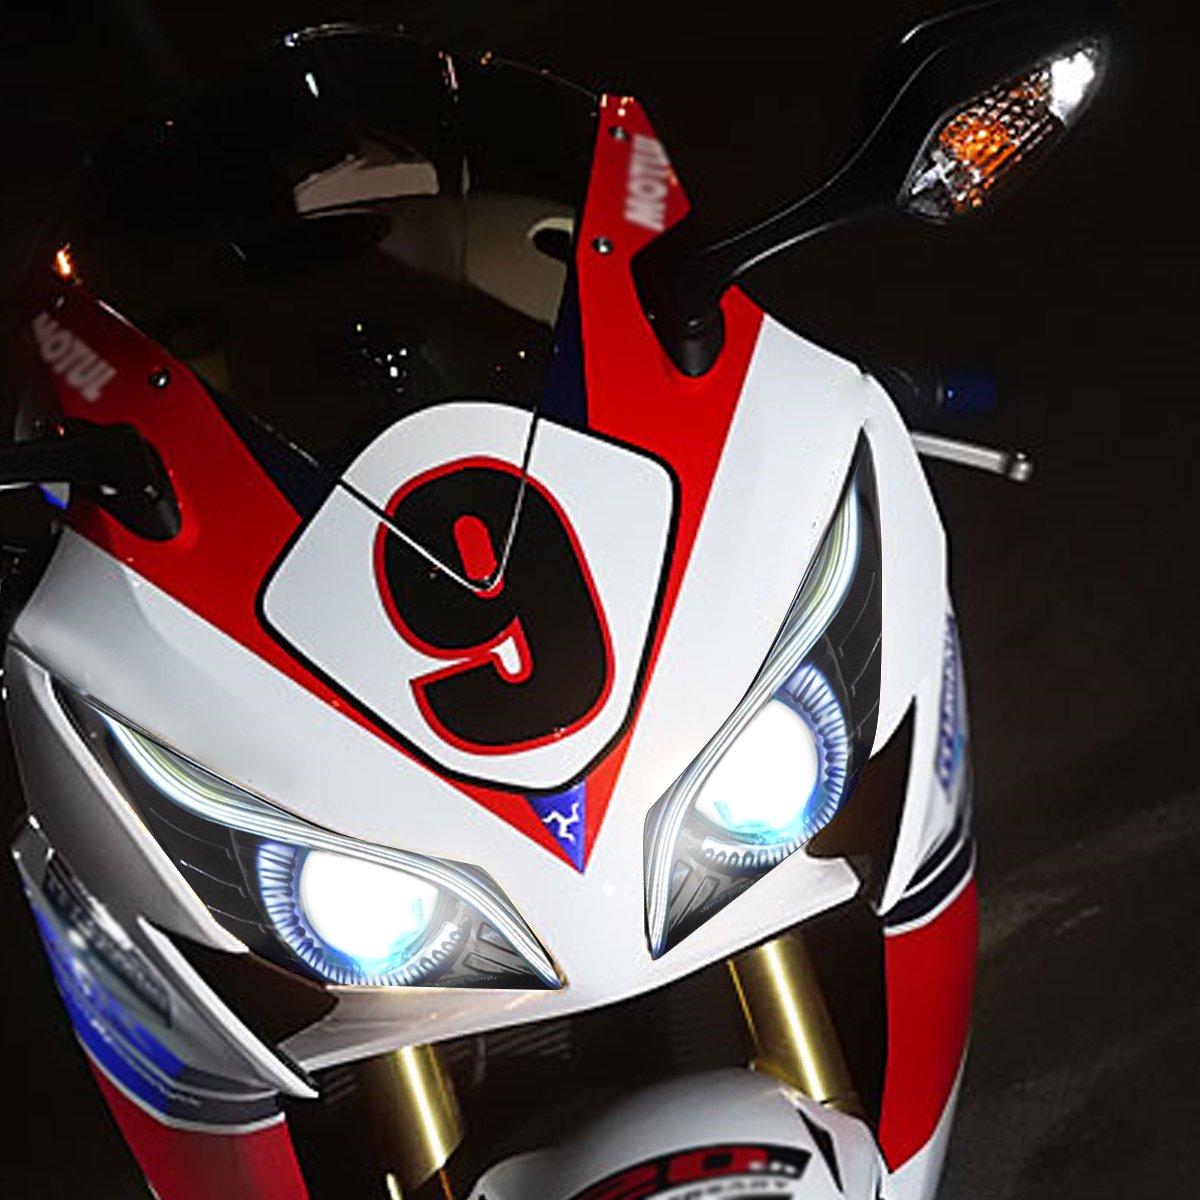 Kt Eagle Eye Led Drl Headlight Assembly For Honda Cbr Relays Wiring Diagram Cbr1000rr 2012 2016 V2 Red Demon Automotive